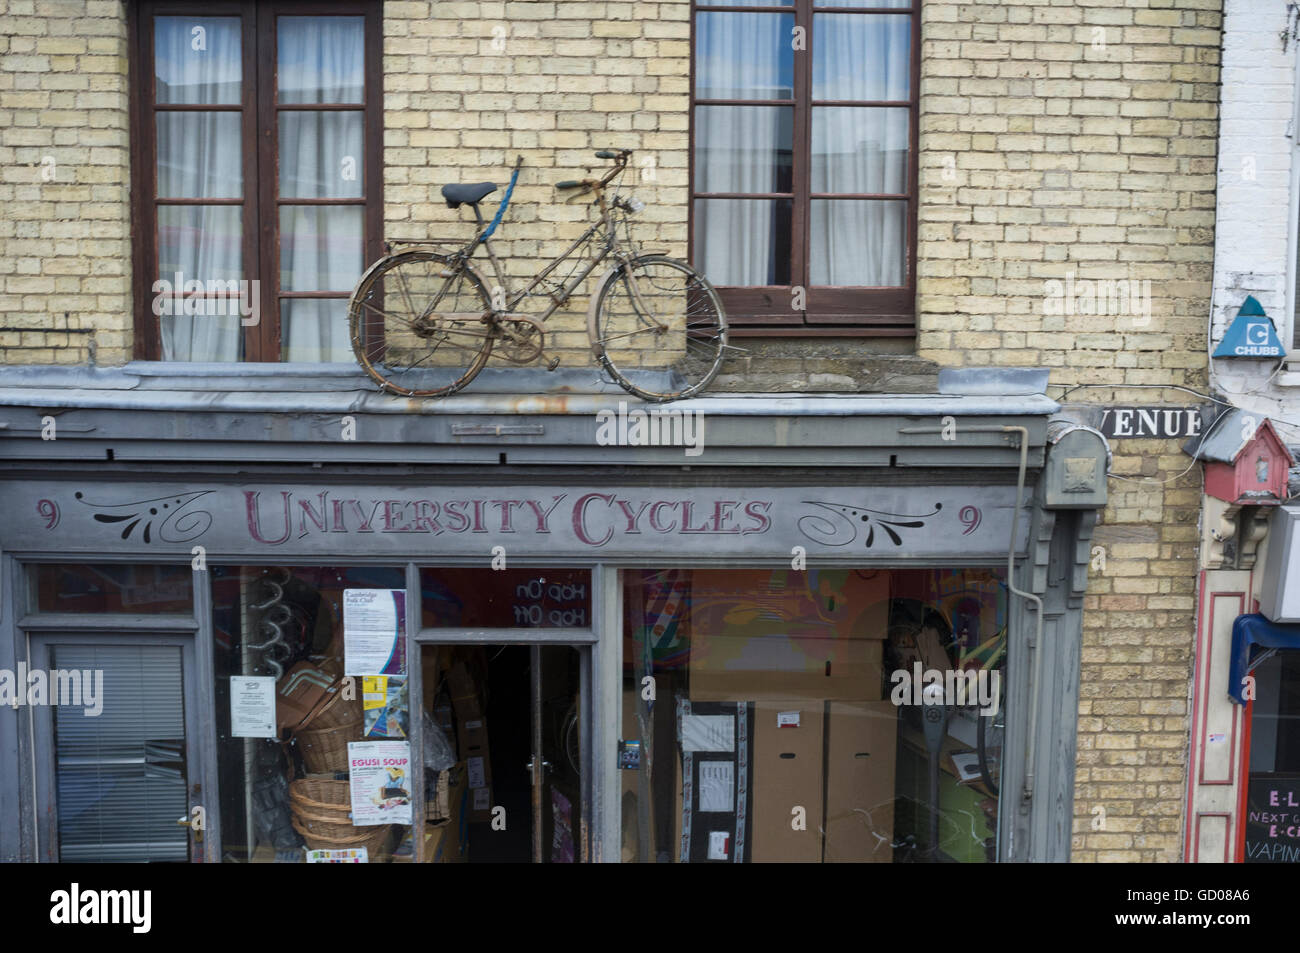 Vintage bicycle on top of University Cycles, Cambridge, England - Stock Image